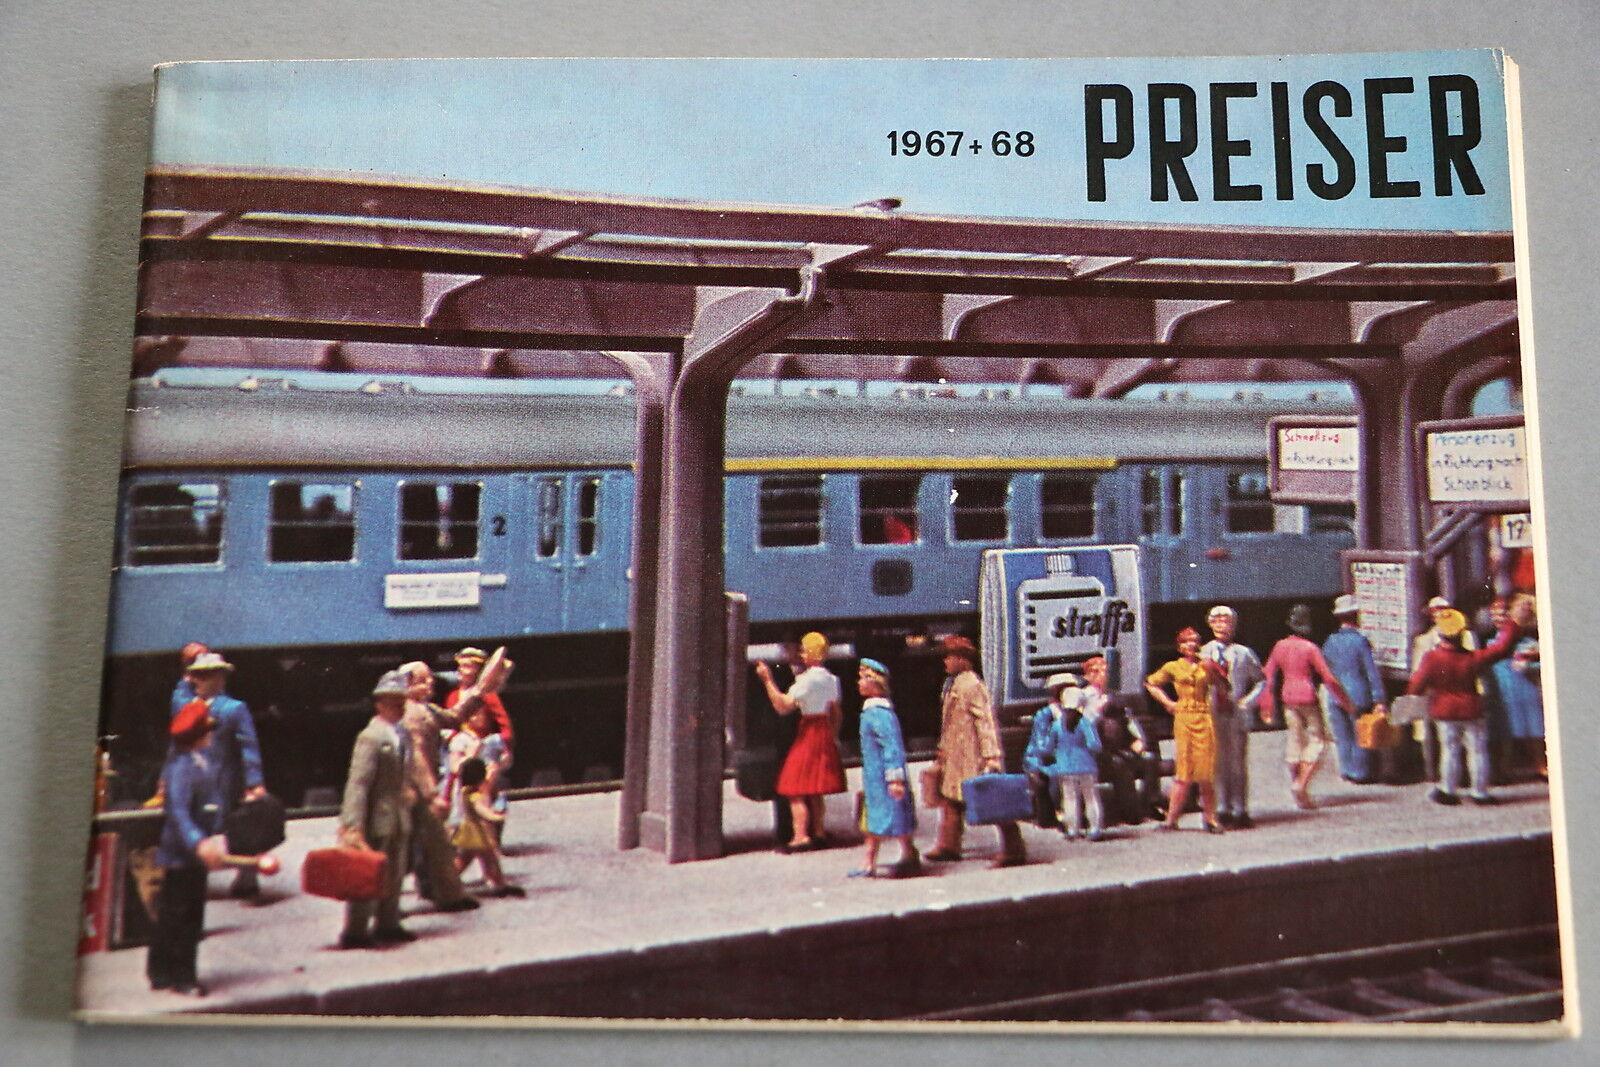 X420 PREISER Train personnage catalogueHo 1967 68 80pg Deutsch katalog +prix 67